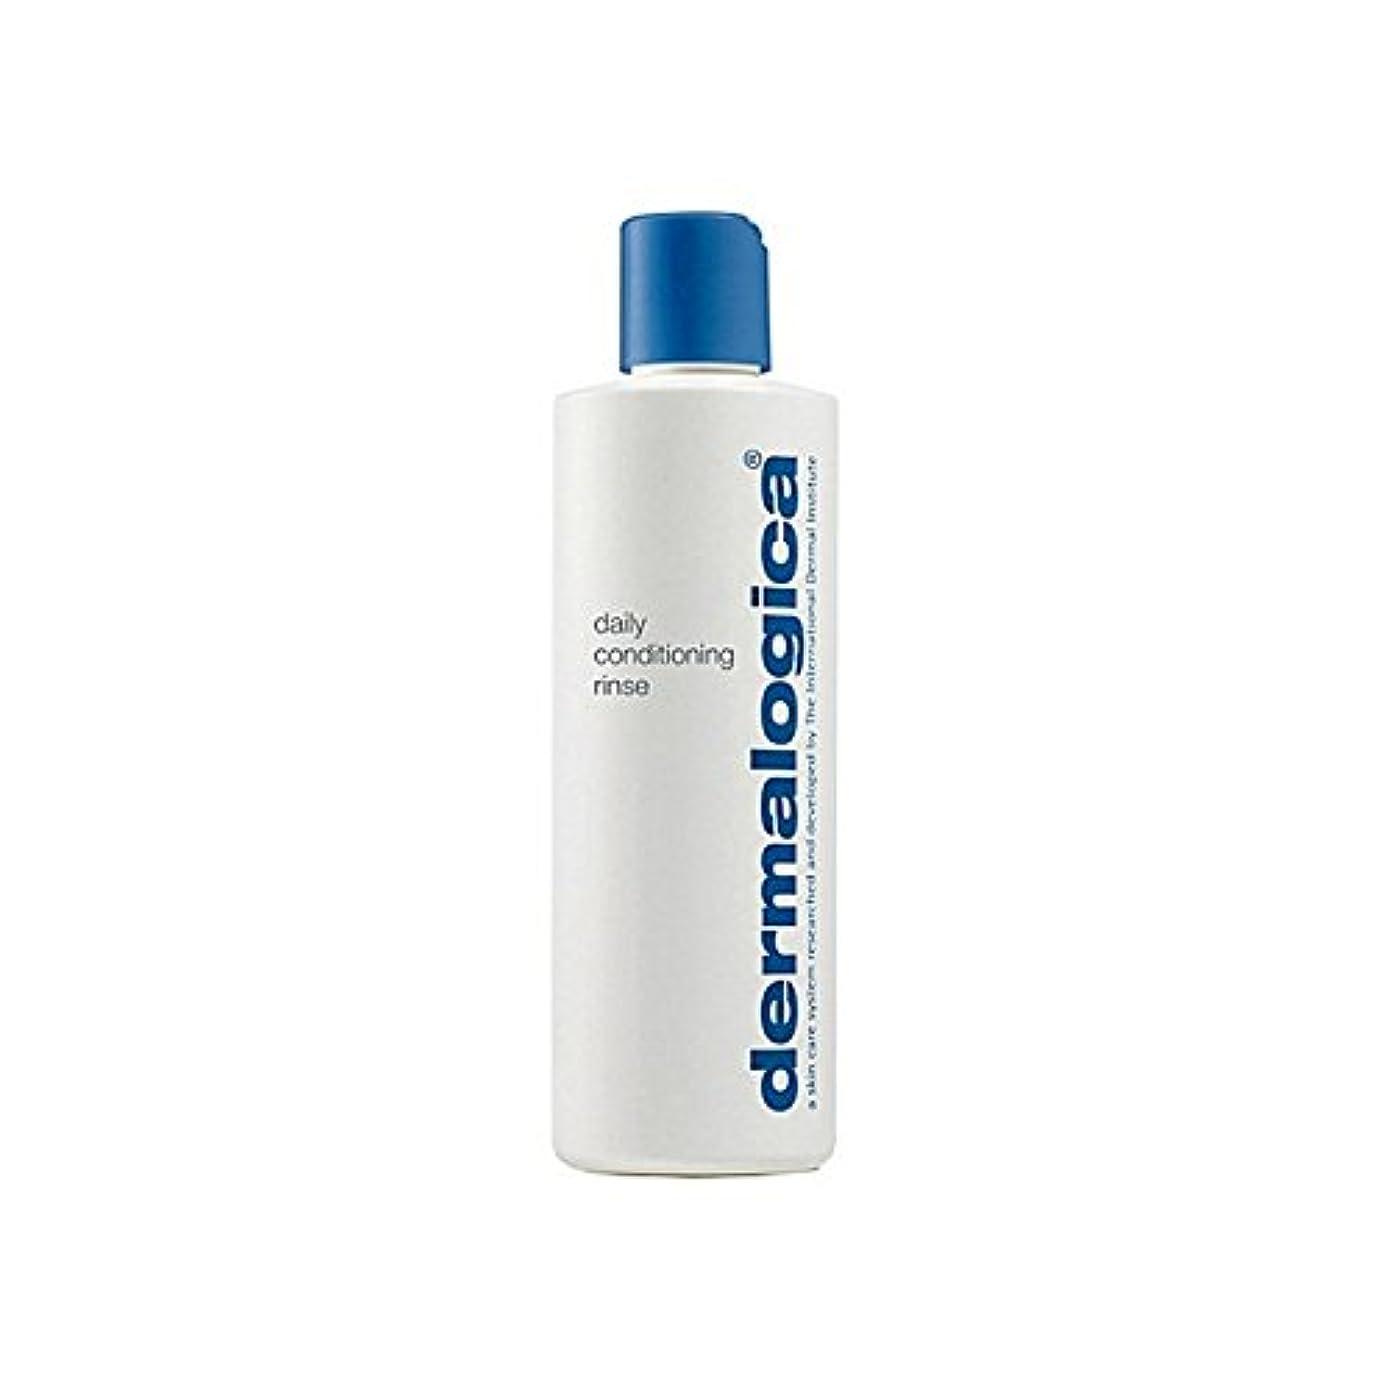 Dermalogica Daily Conditioning Rinse 50ml (Pack of 6) - ダーマロジカ毎日コンディショニングリンス50ミリリットル x6 [並行輸入品]